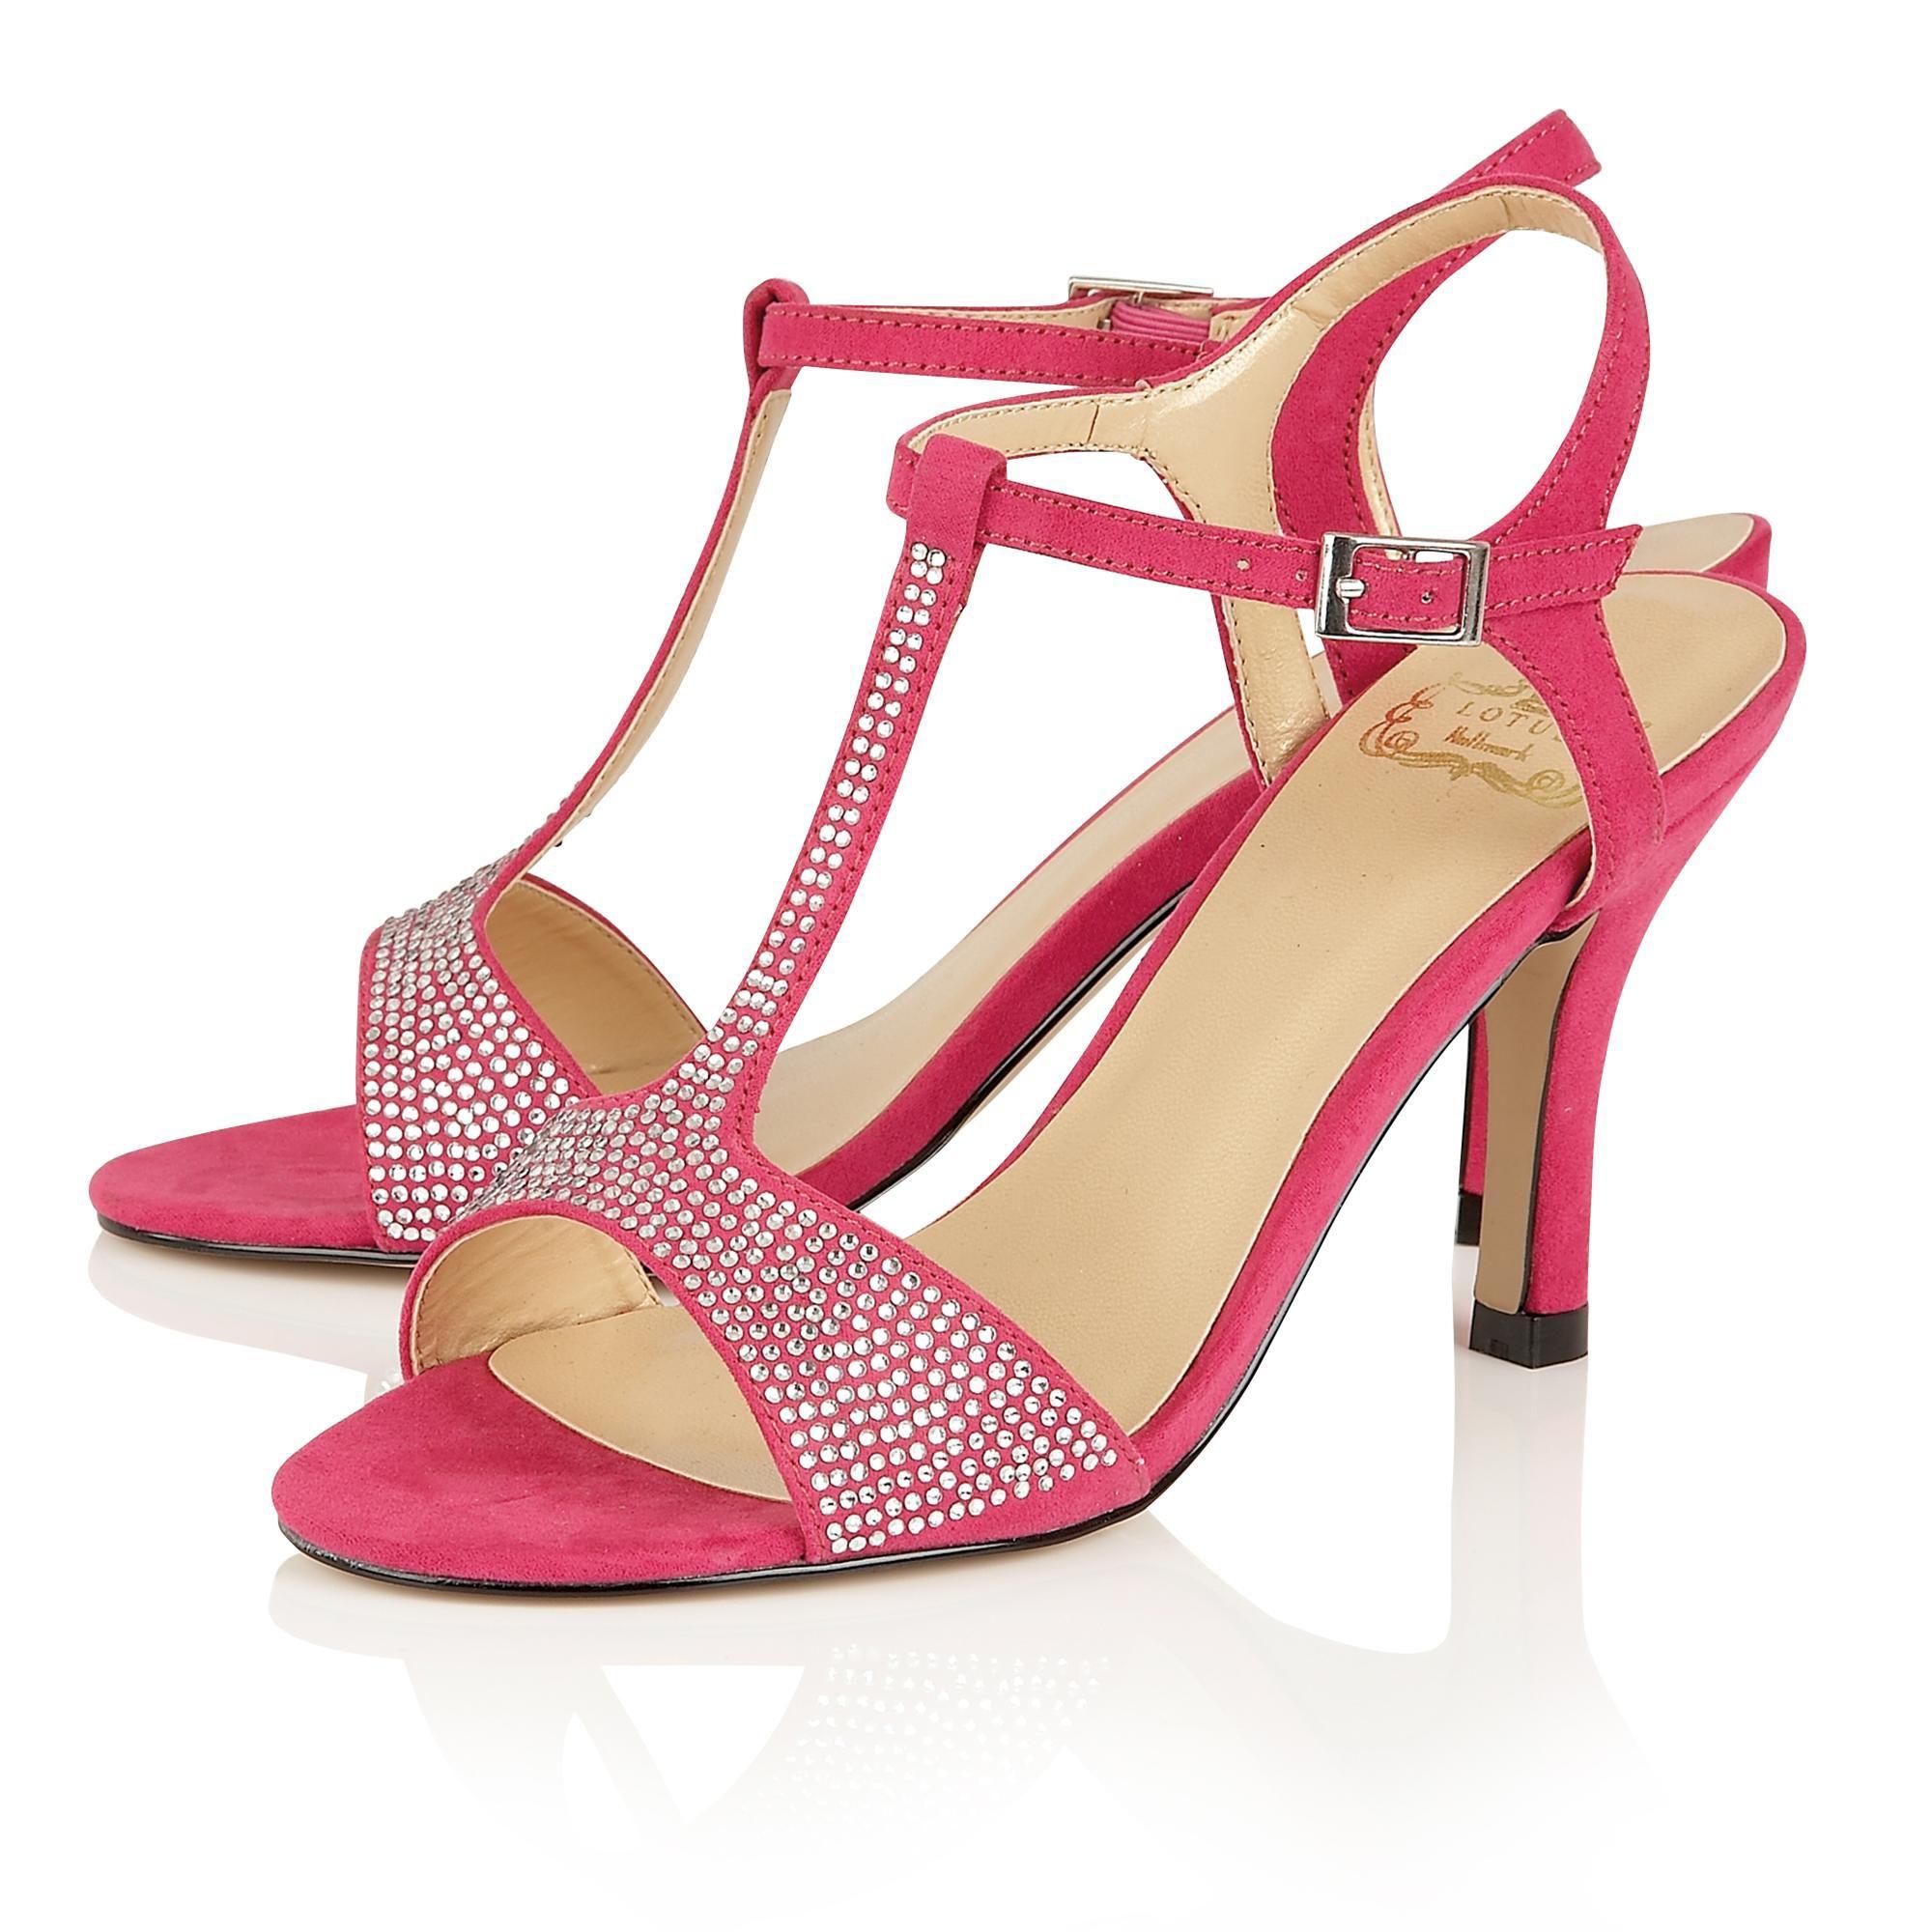 Lotus Pink Court Shoes